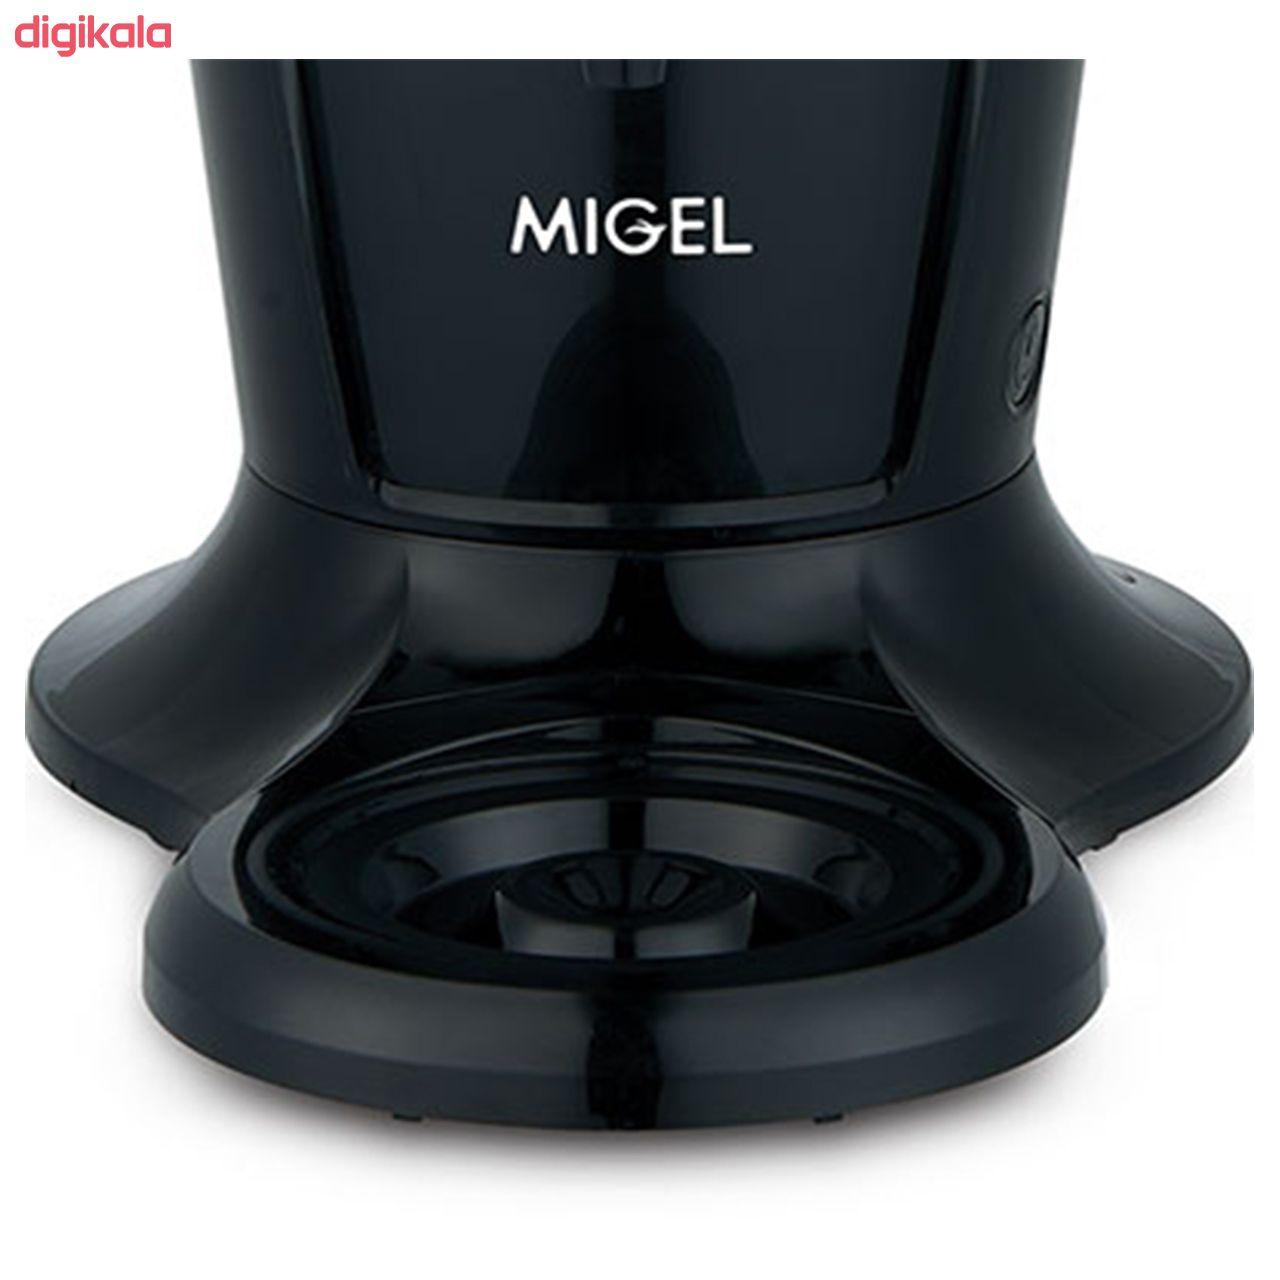 چای ساز میگل مدل GTS 300  main 1 4